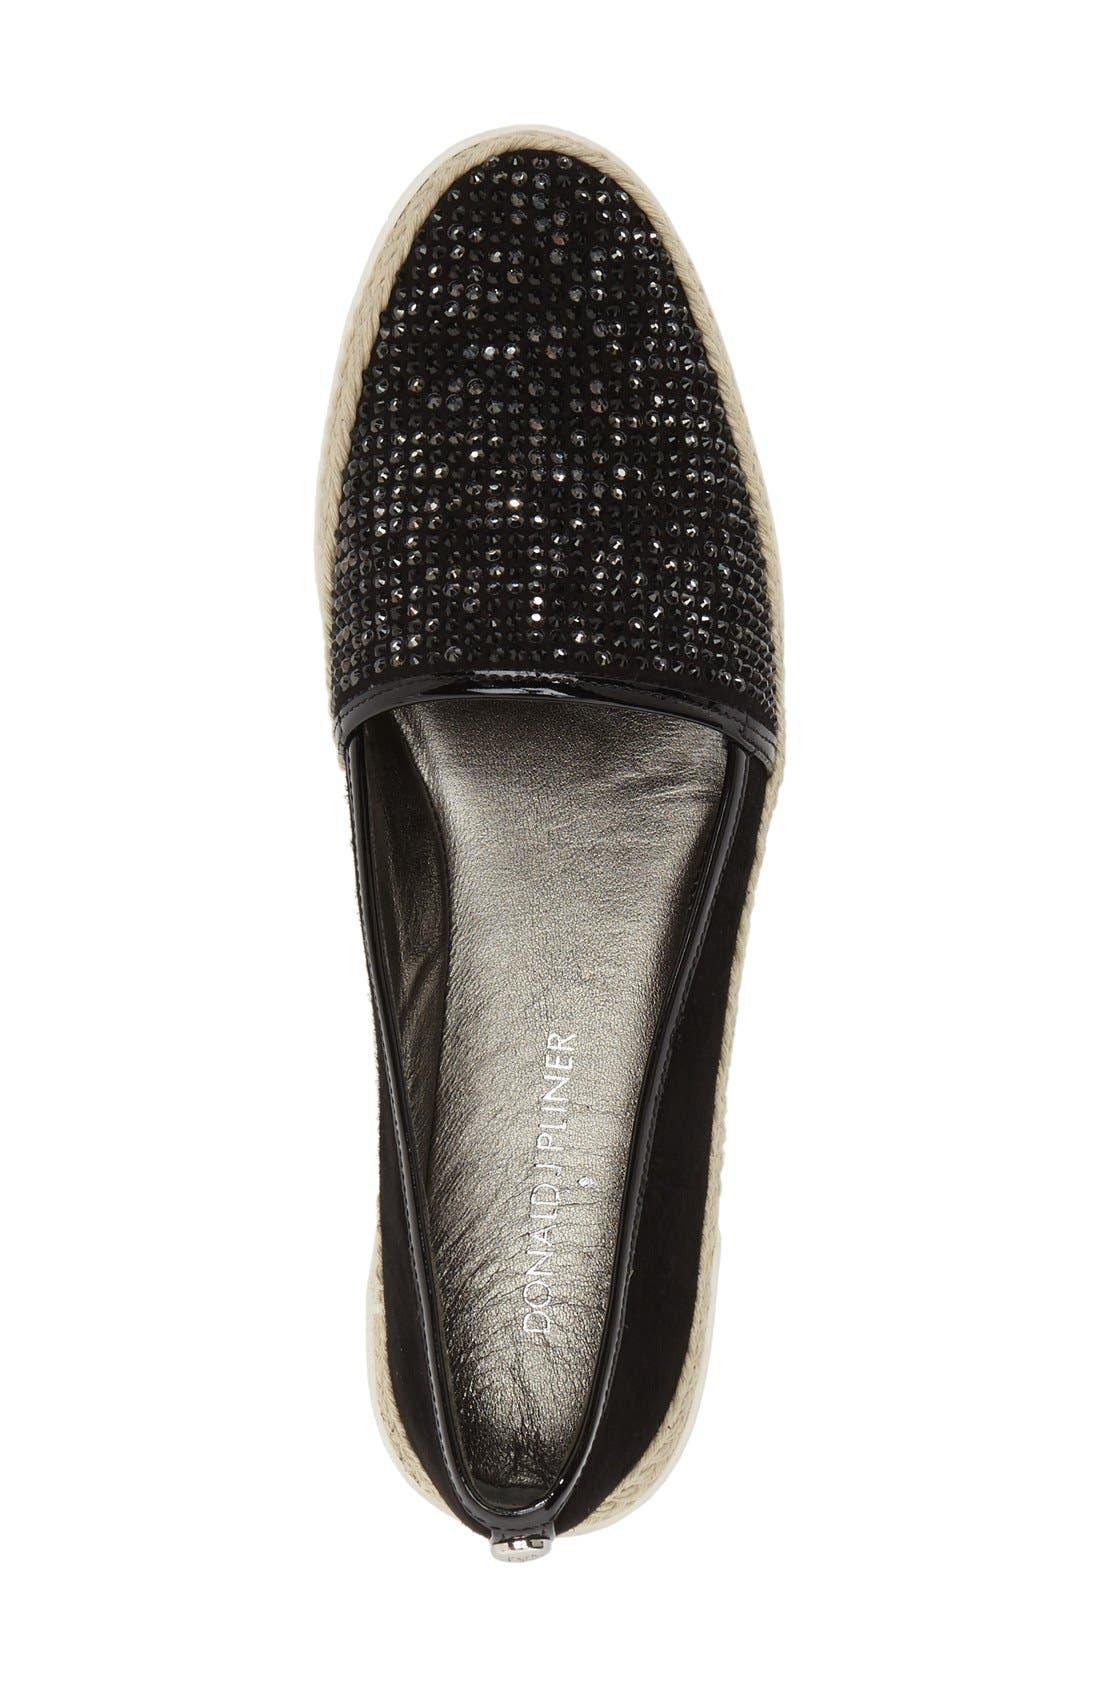 Alternate Image 3  - Donald J Pliner 'Piza' Espadrille Slip-On Flat (Women)